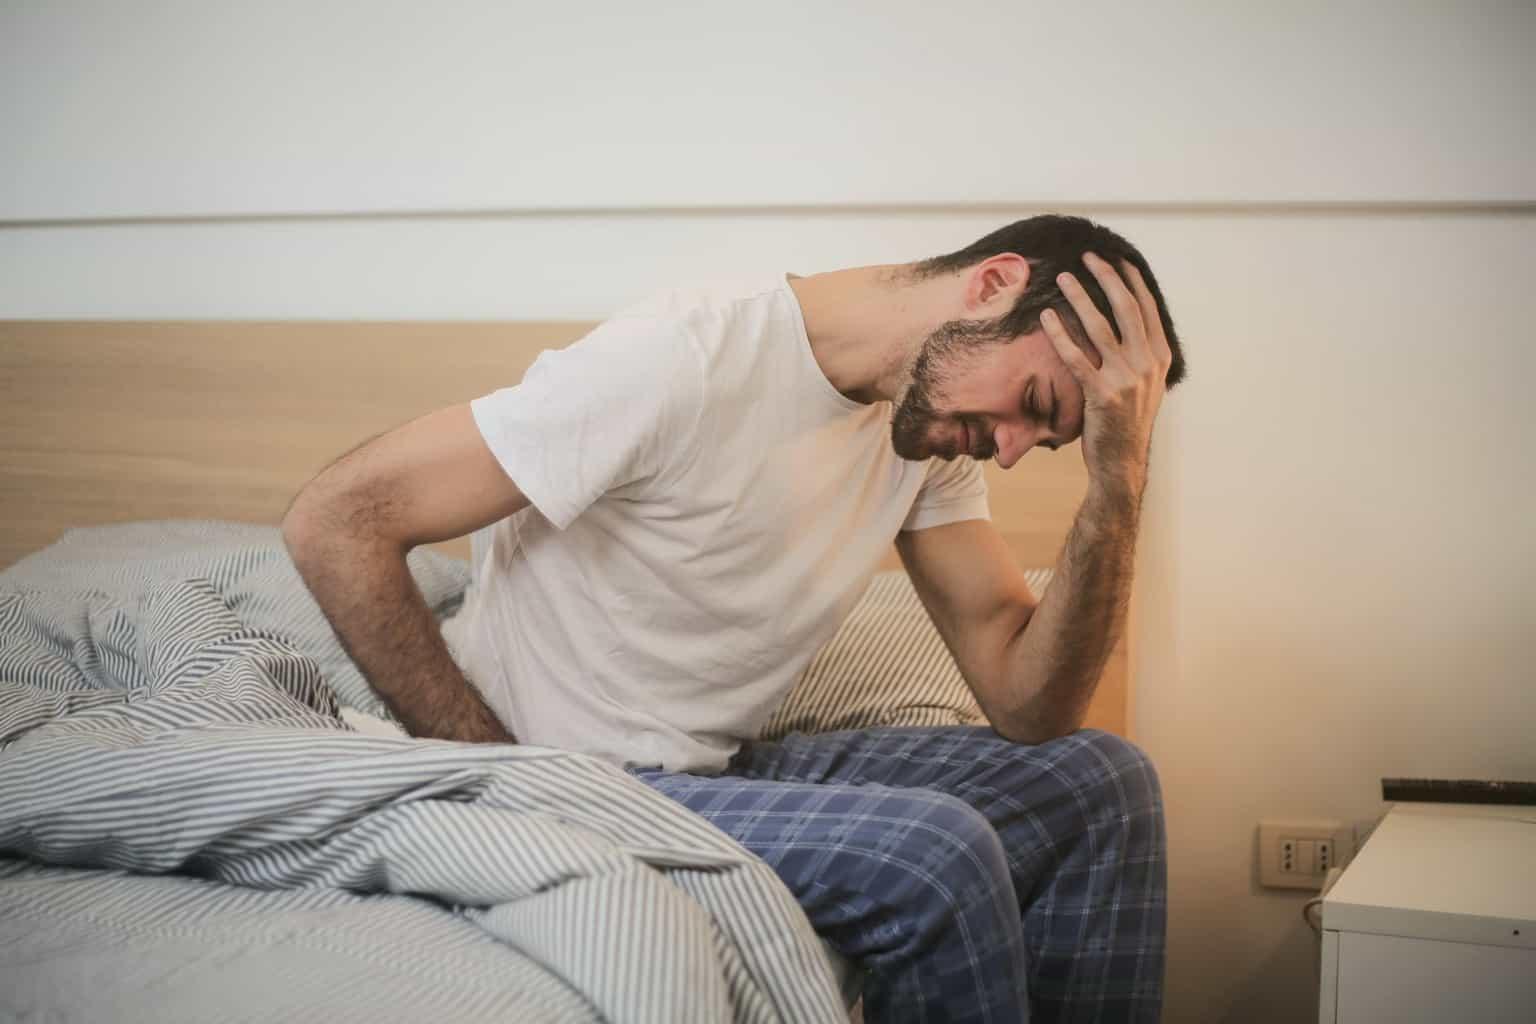 young man in sleepwear suffering from headache in morning